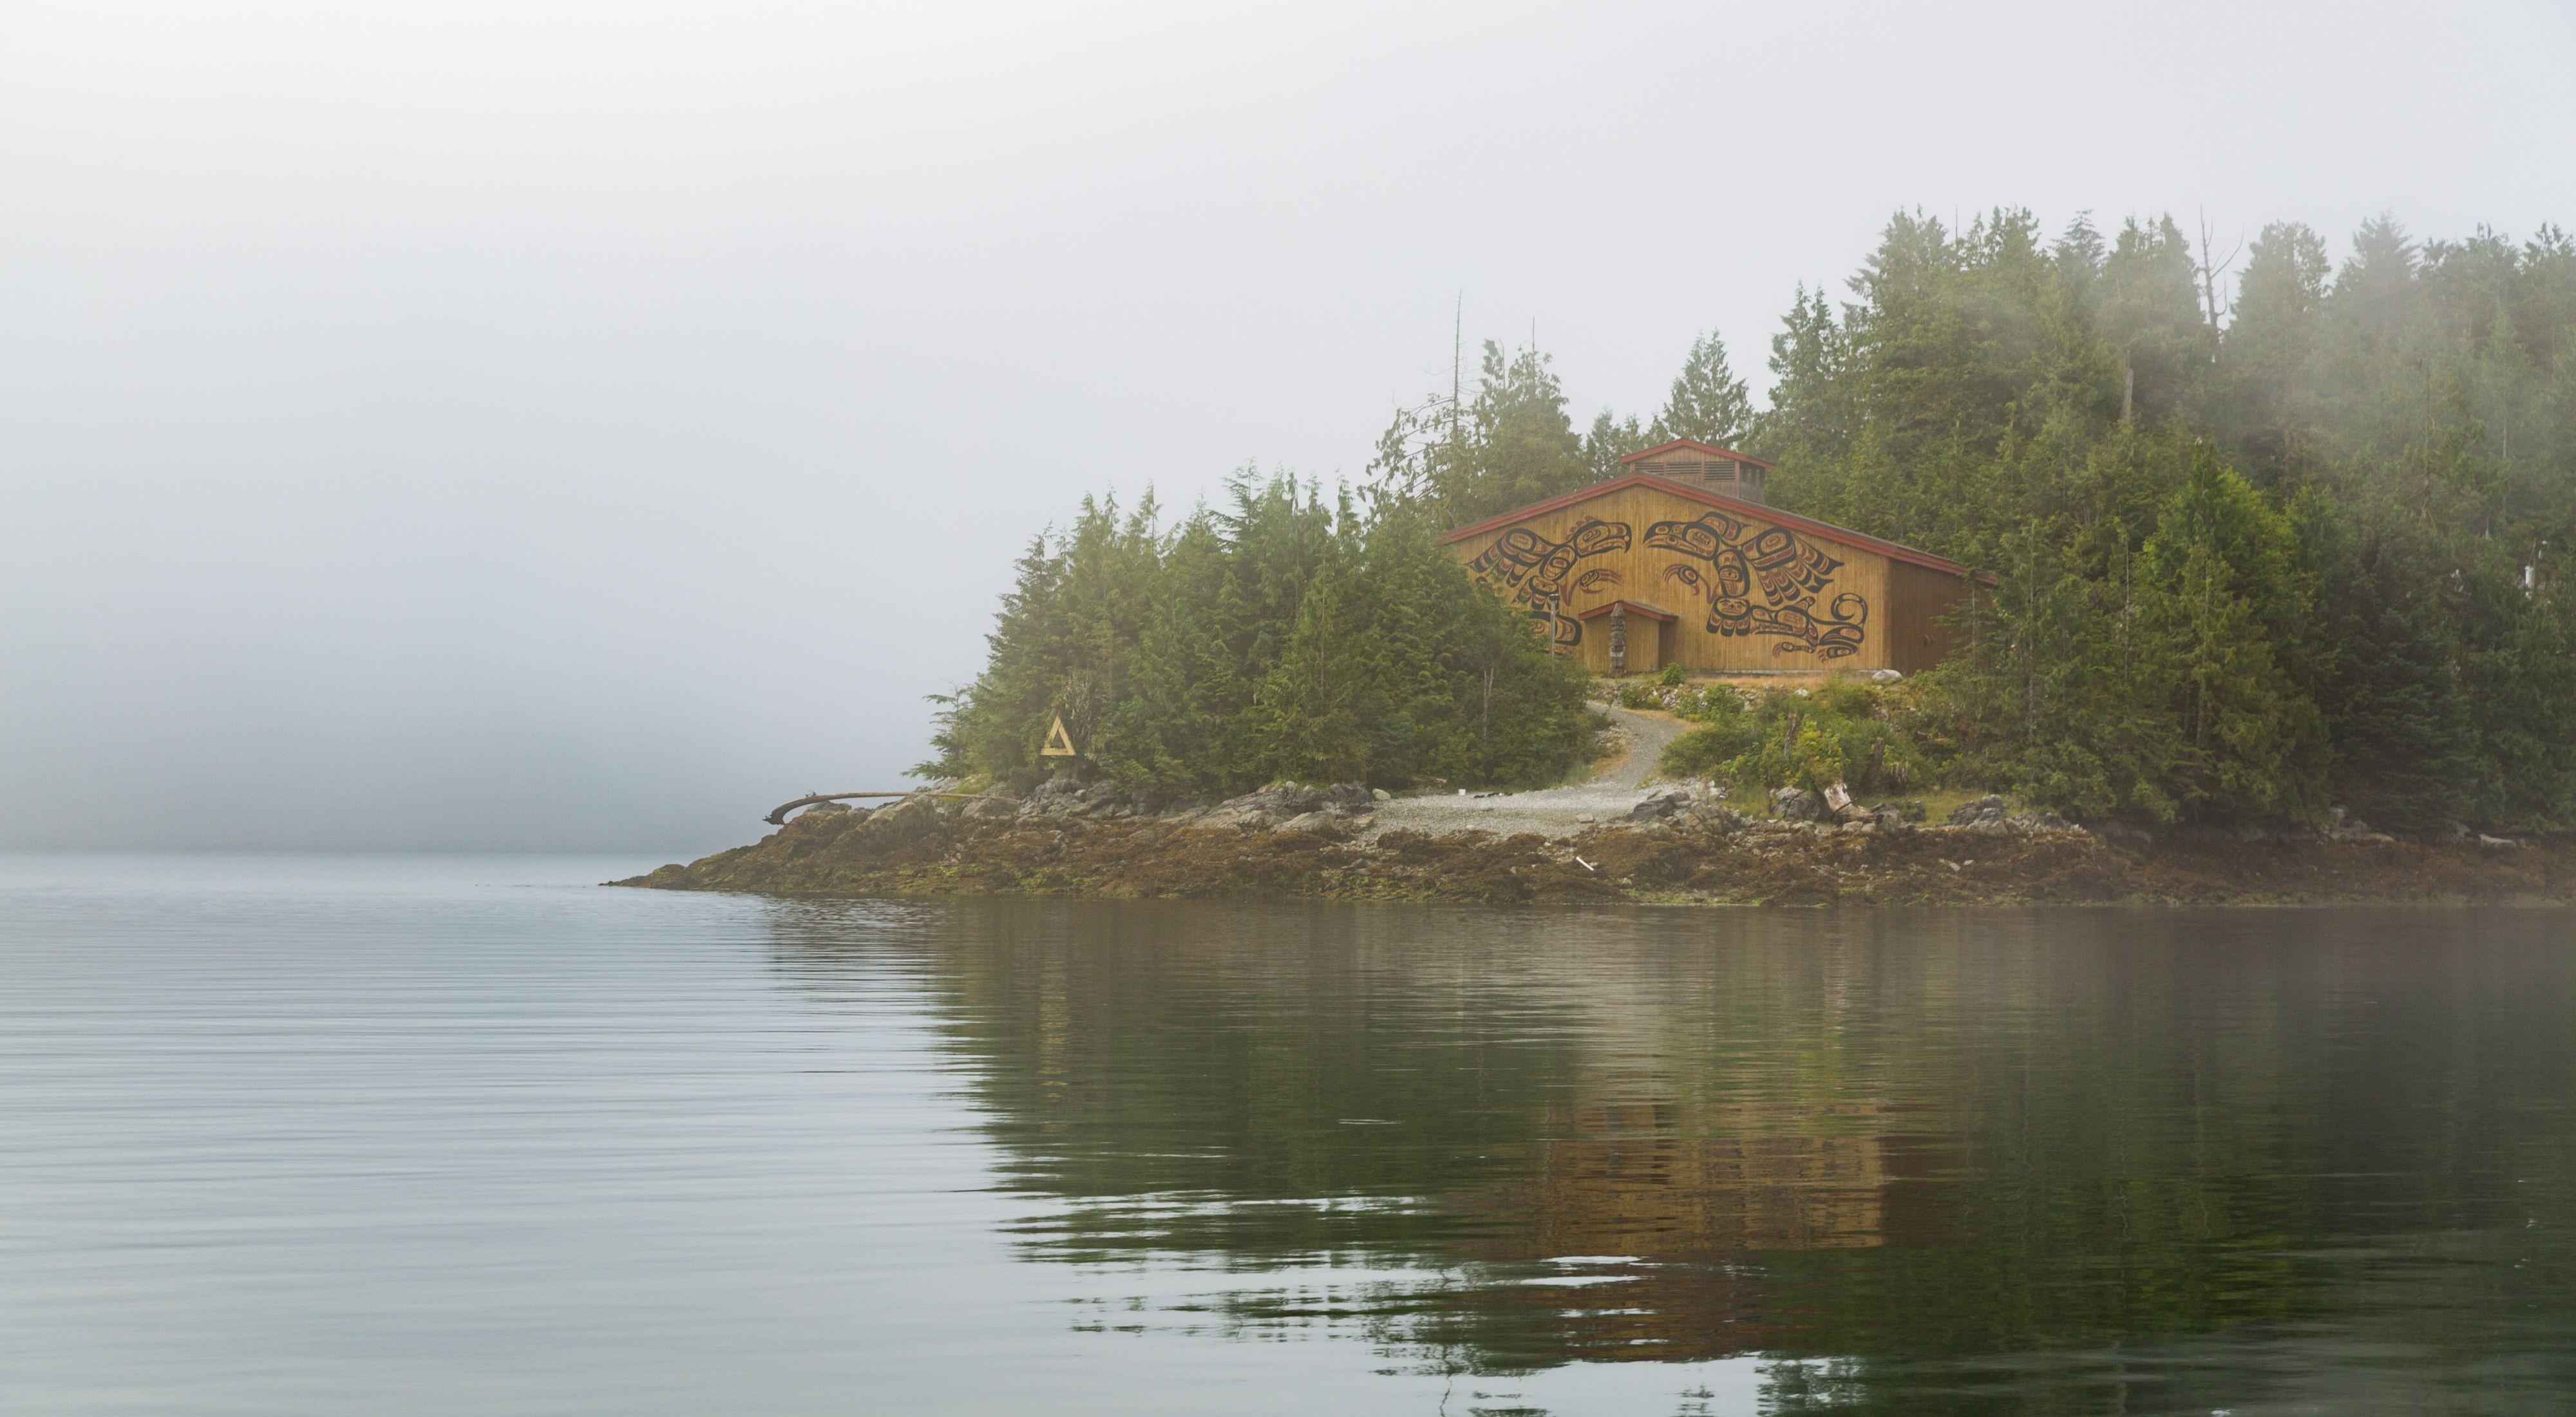 The Kitasoo/Xai'xais Nation's Big House in Klemtu, BC, Canada.